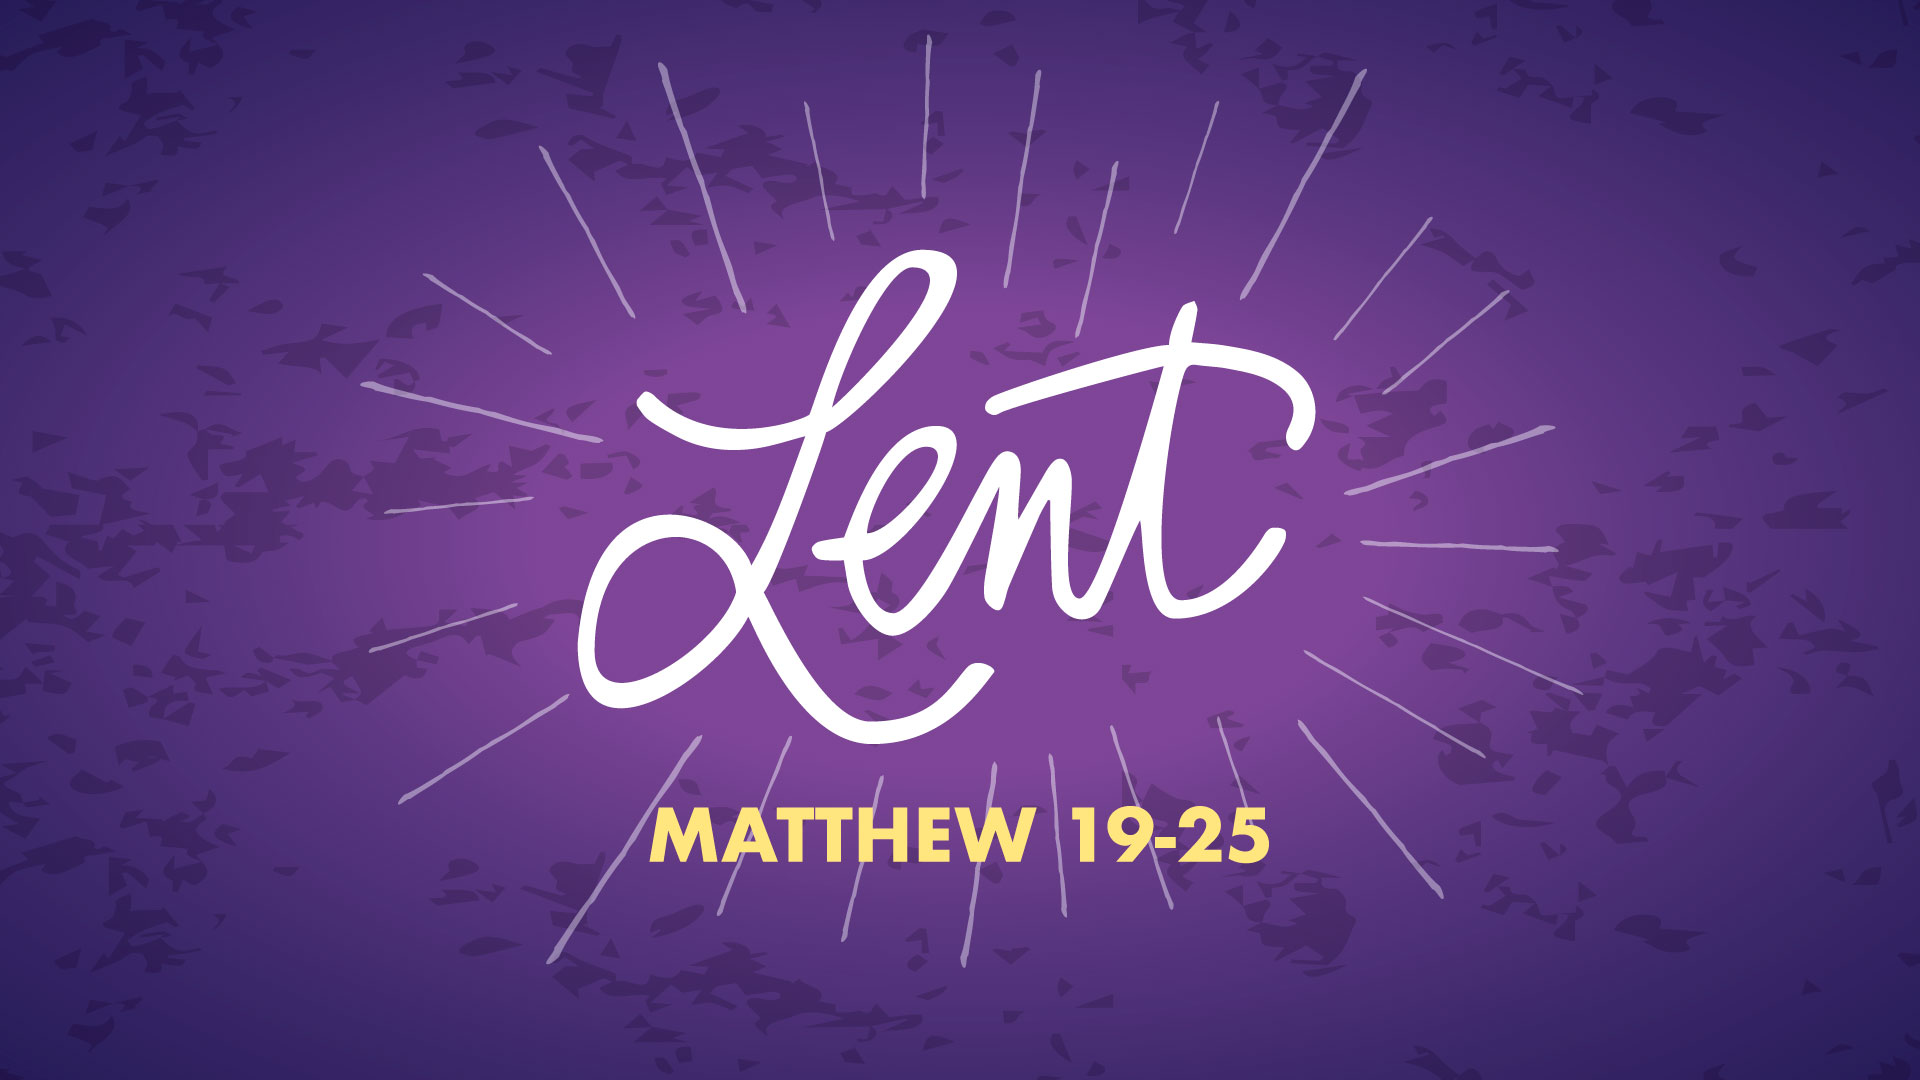 Lent: Matthew 19-25